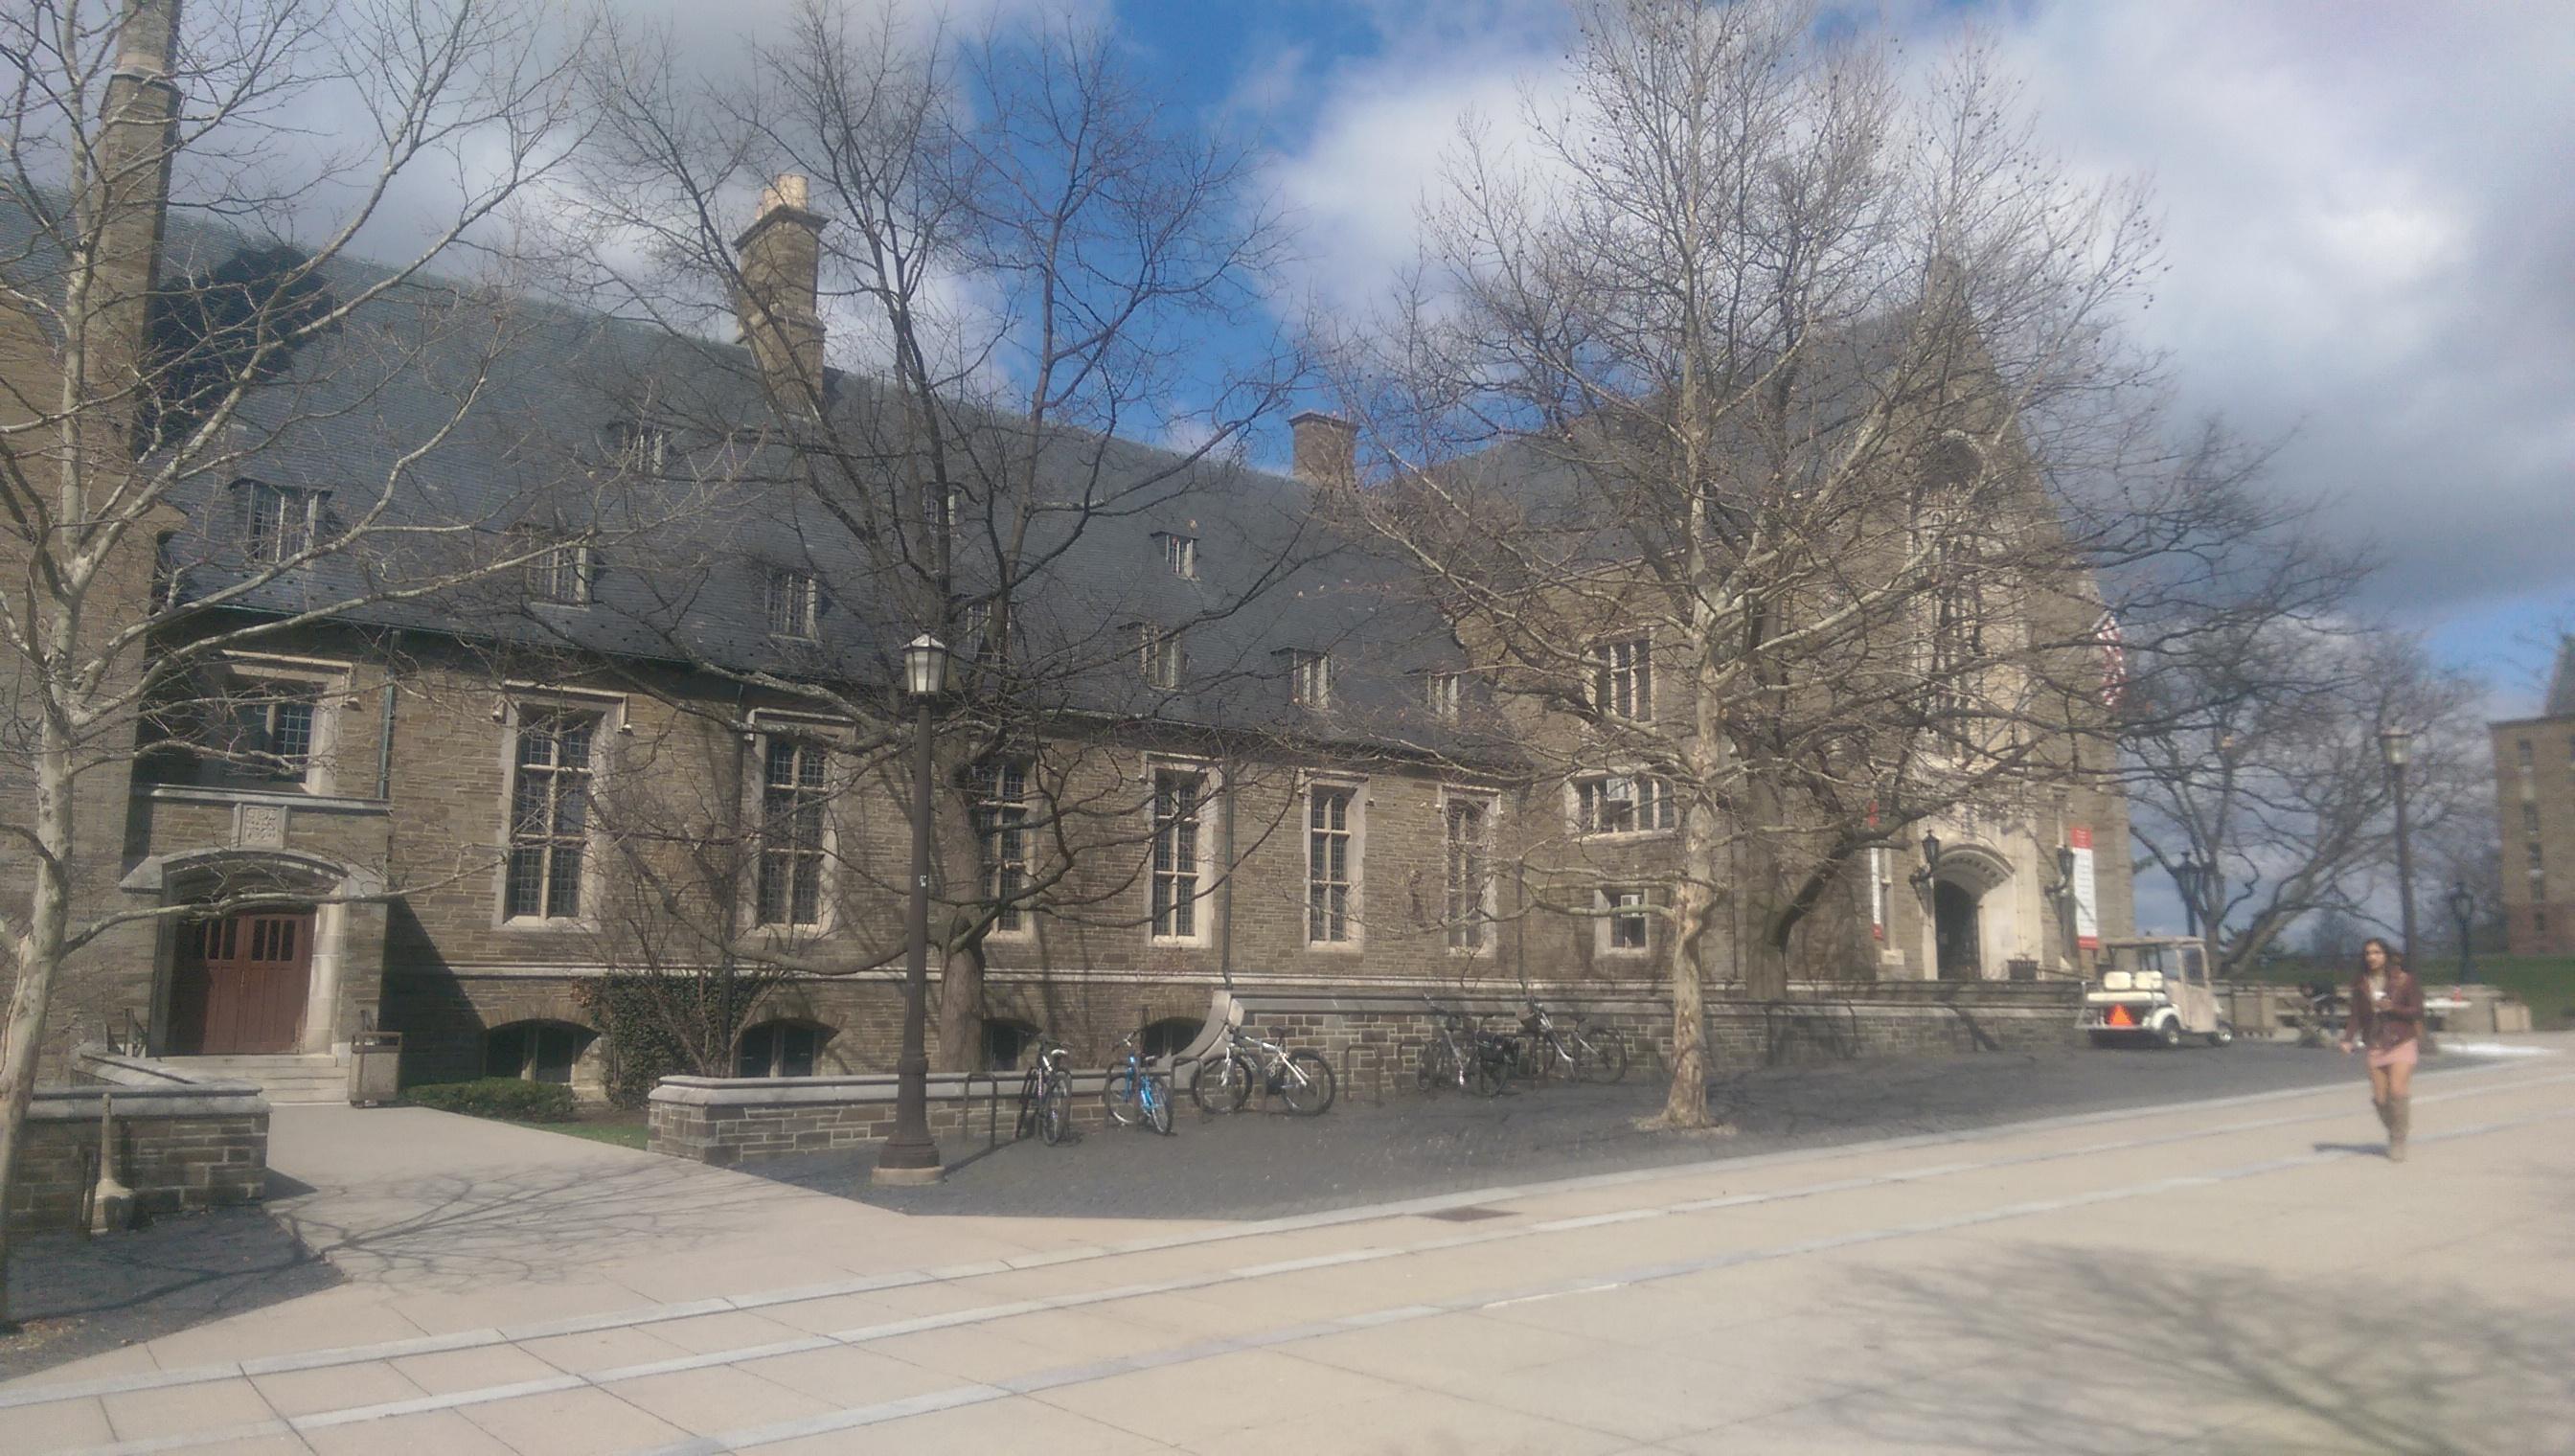 Architecture at Cornell - Edward Tremel on